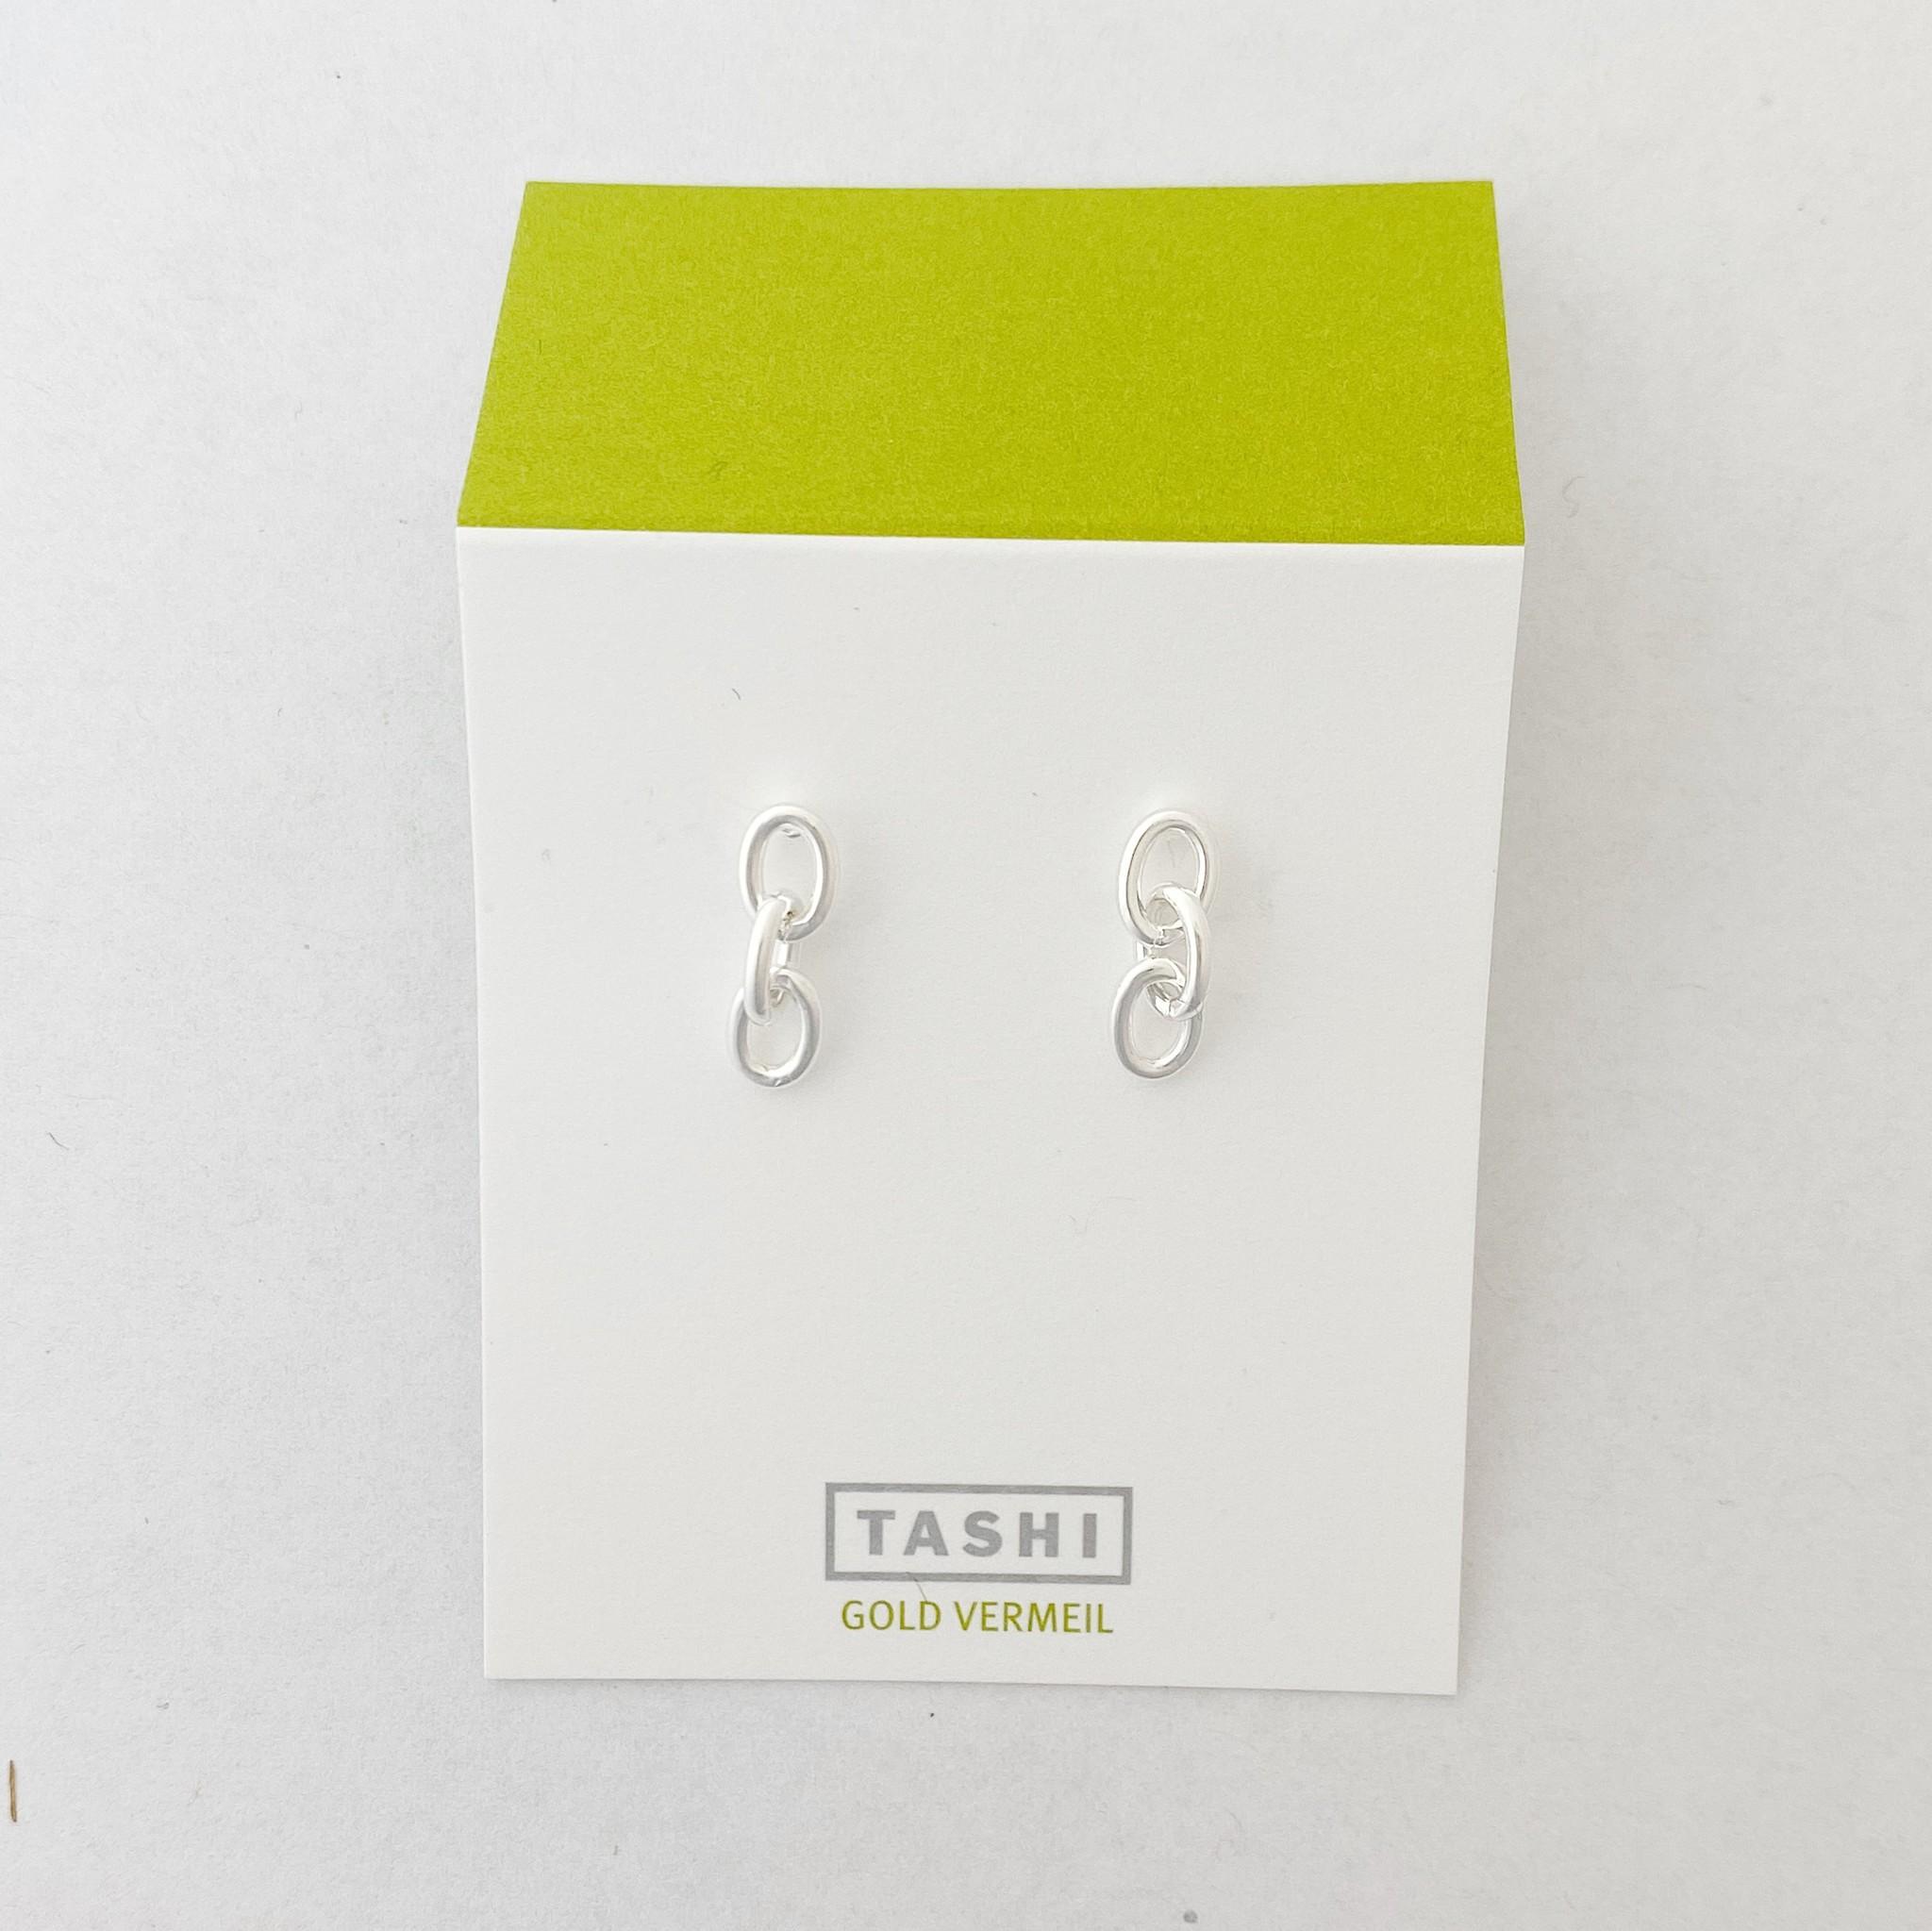 Tashi Silver Chain Link Stud